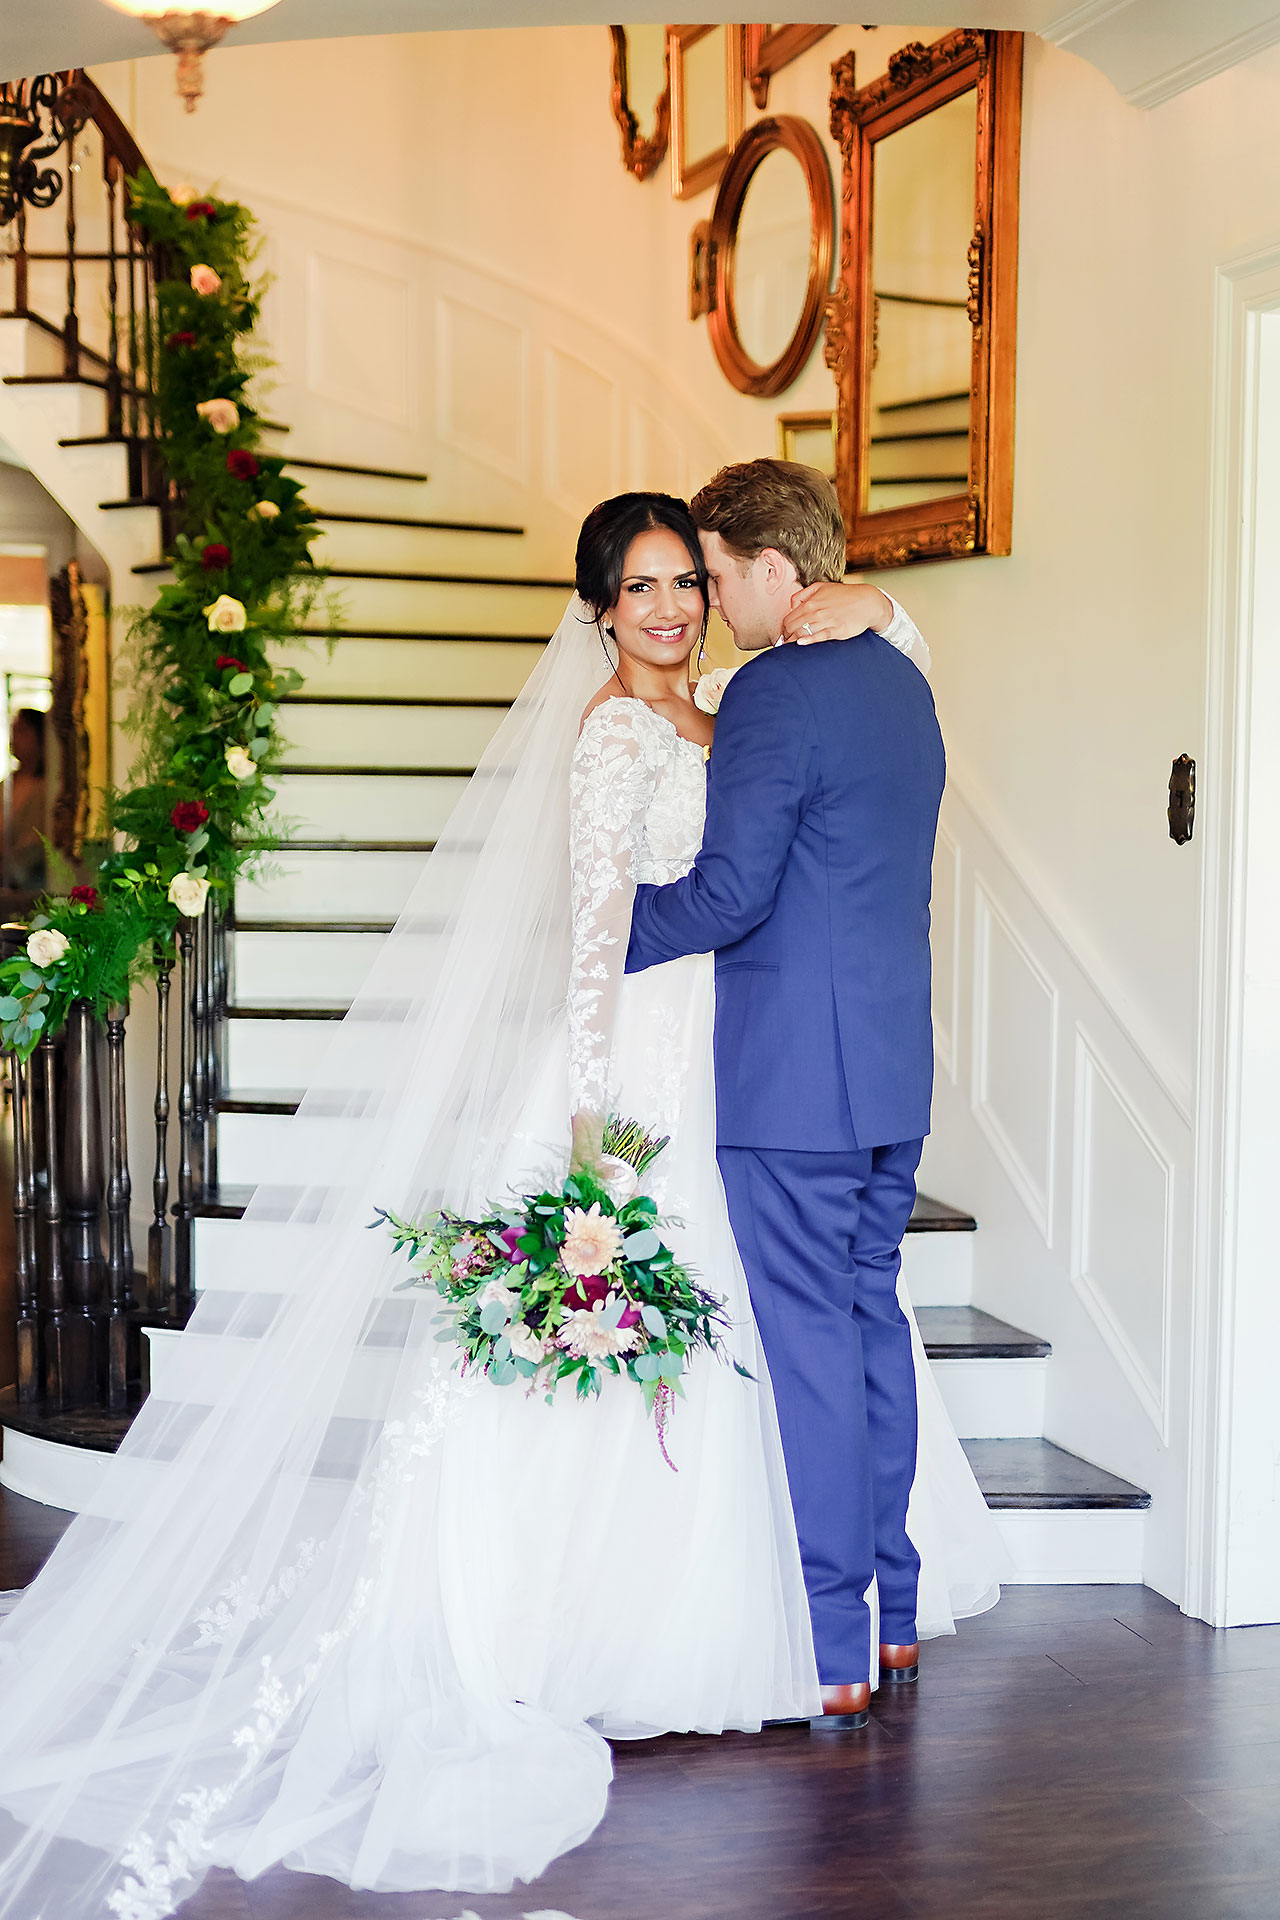 Nadia Parker Black Iris Estate Carmel Indiana Wedding May 2021 135